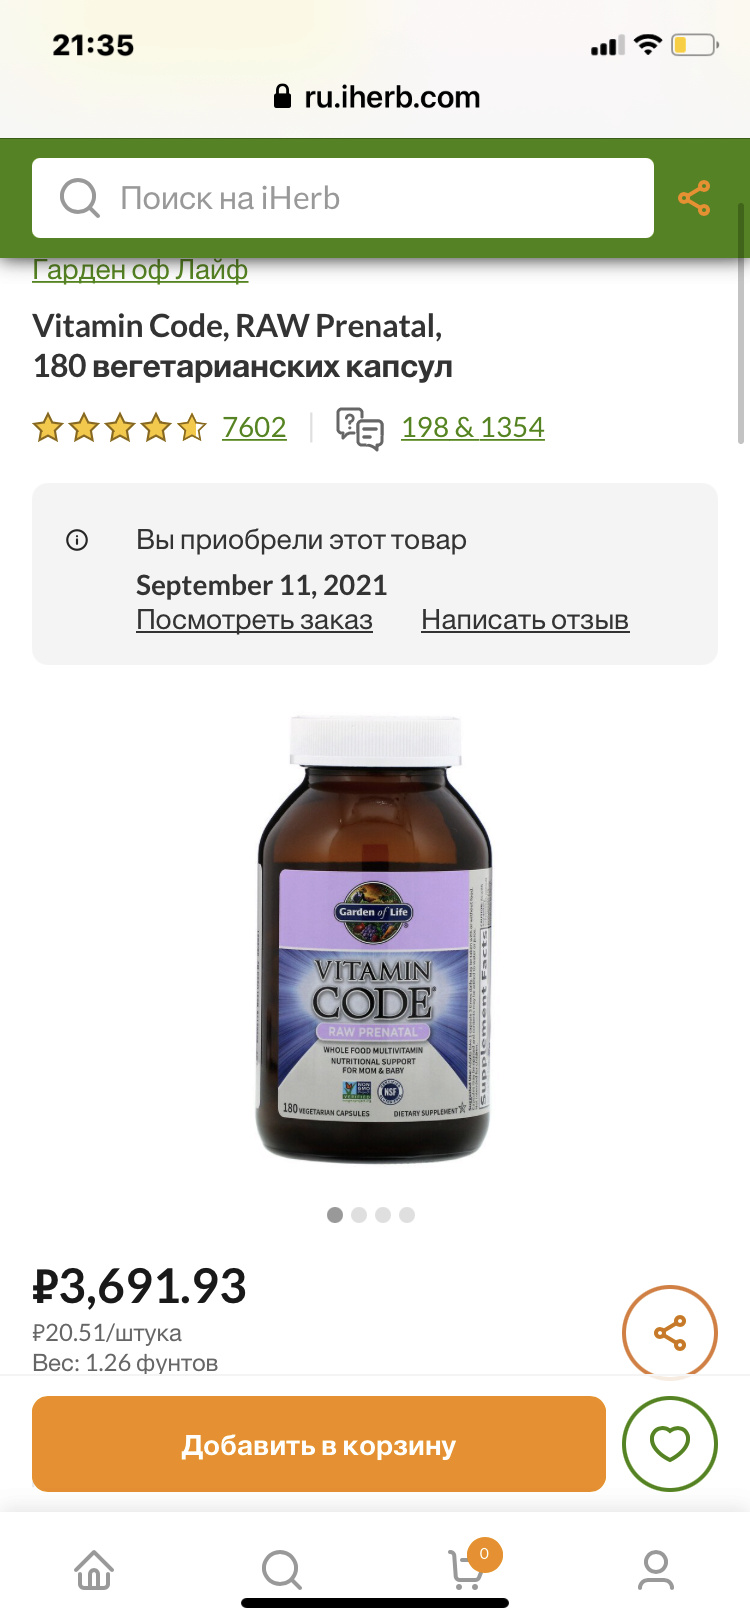 Витамины для беременных с iherb  503a6710